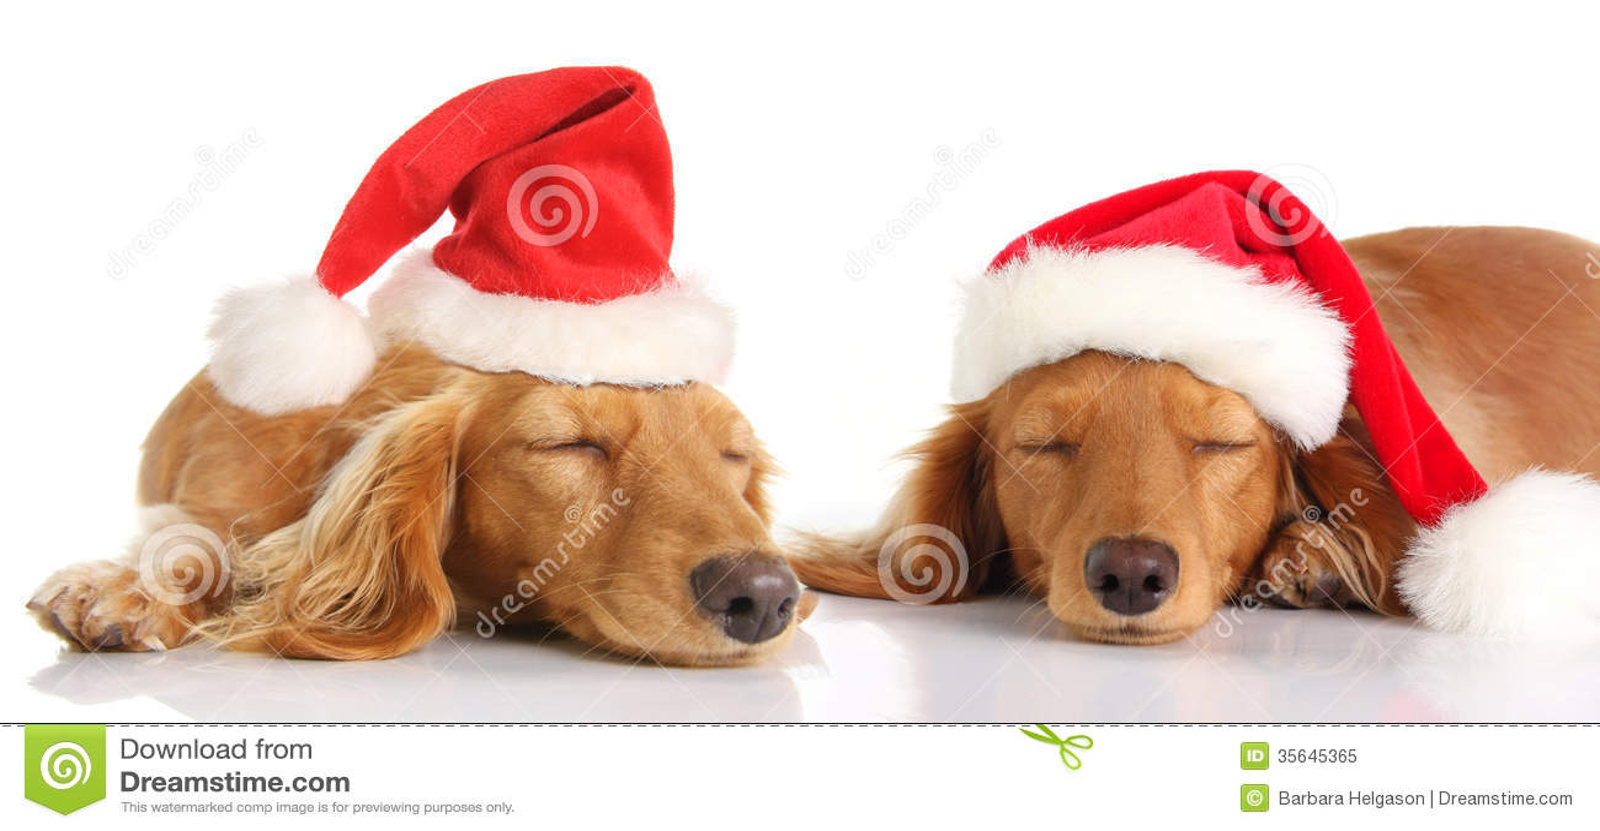 Sleepy Santa Christmas Dogs Royalty Free Stock Photo